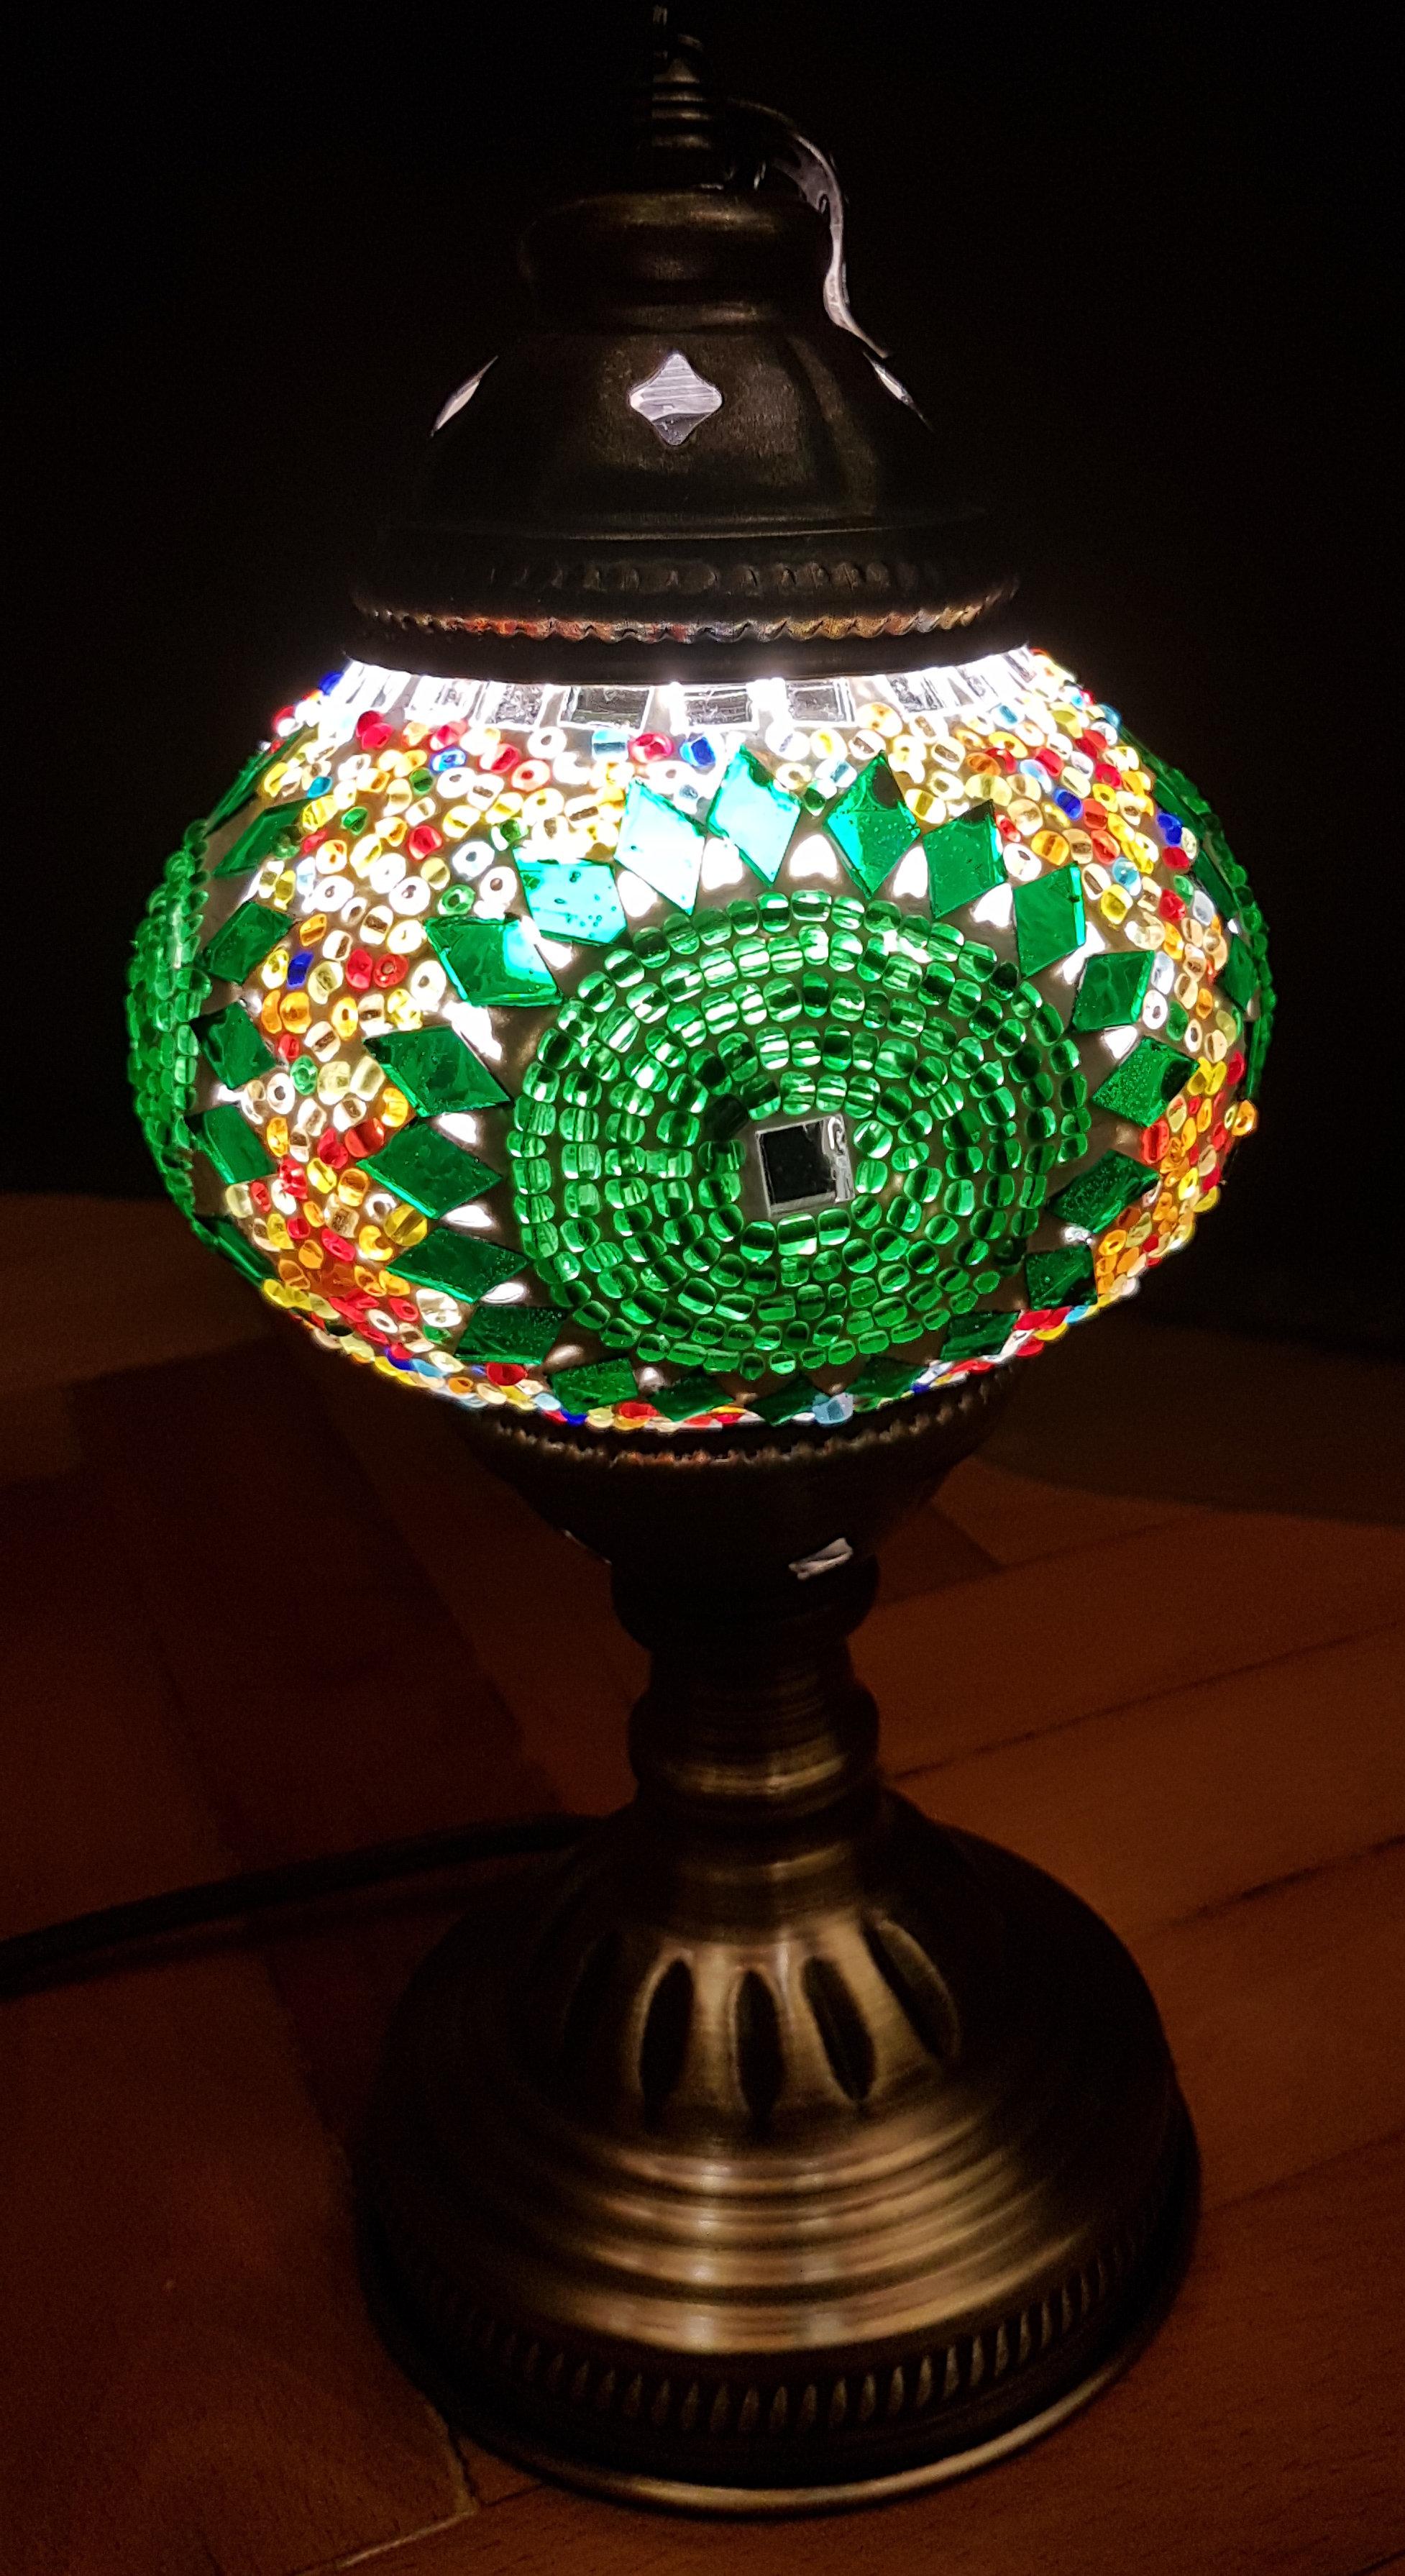 keleties-stilusu-mozaik-lampa-torok-lampa-moroccan-teszt-asztali-fali-fuggo-lampa-02.jpg